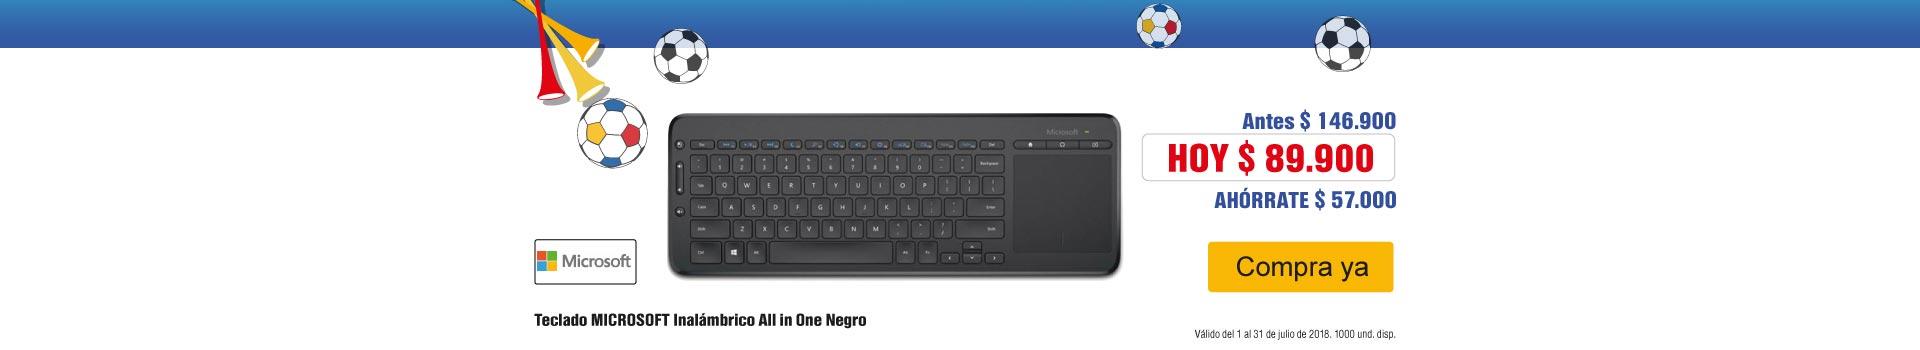 AK-KT-HIPER-1-accesorios-PP----teclado-microsoft-jul4